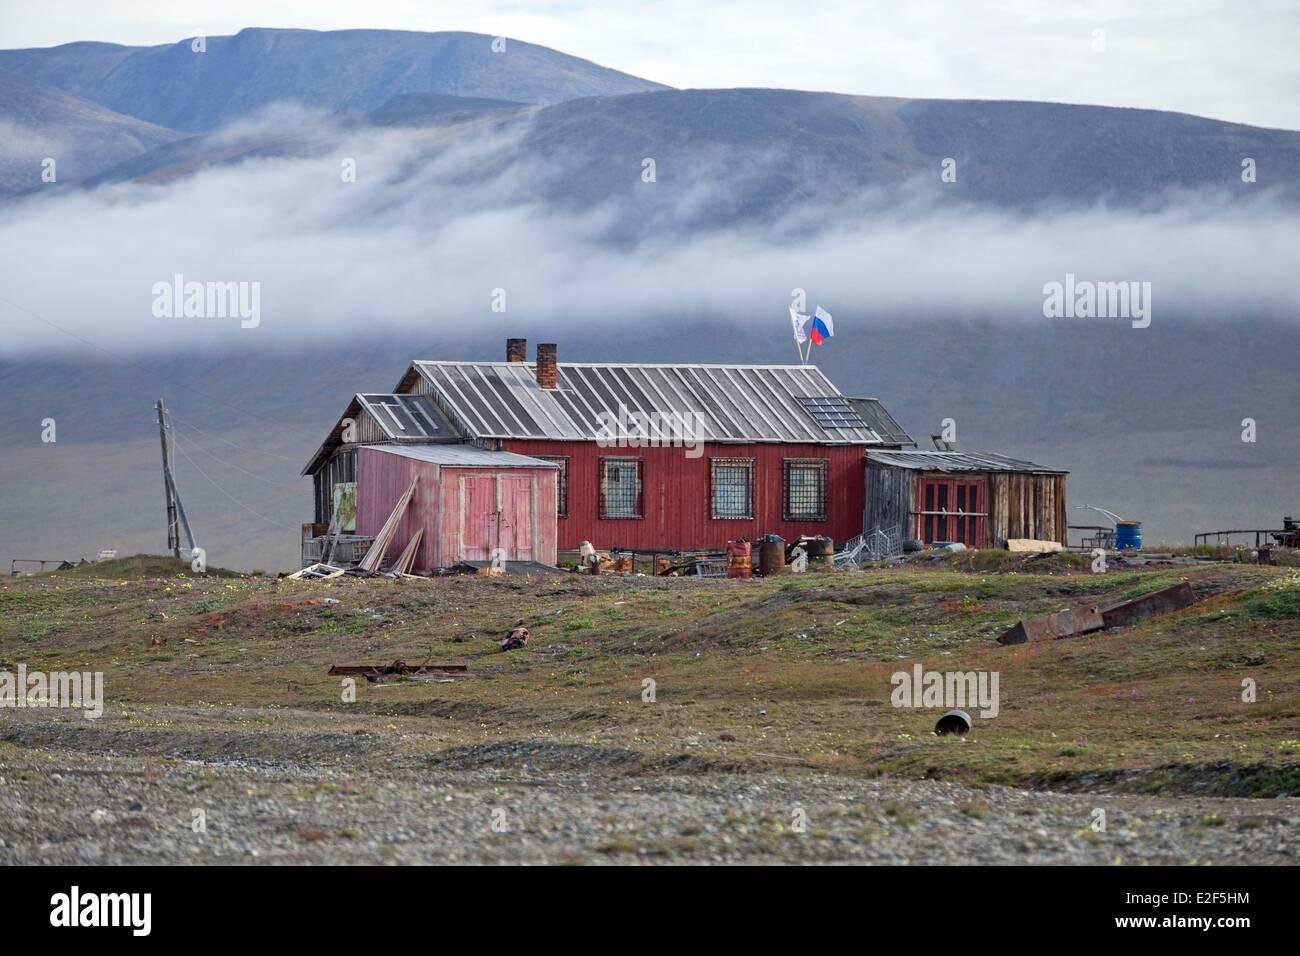 Russia, Chukotka autonomous district, Wrangel island, Doubtful village Stock Photo